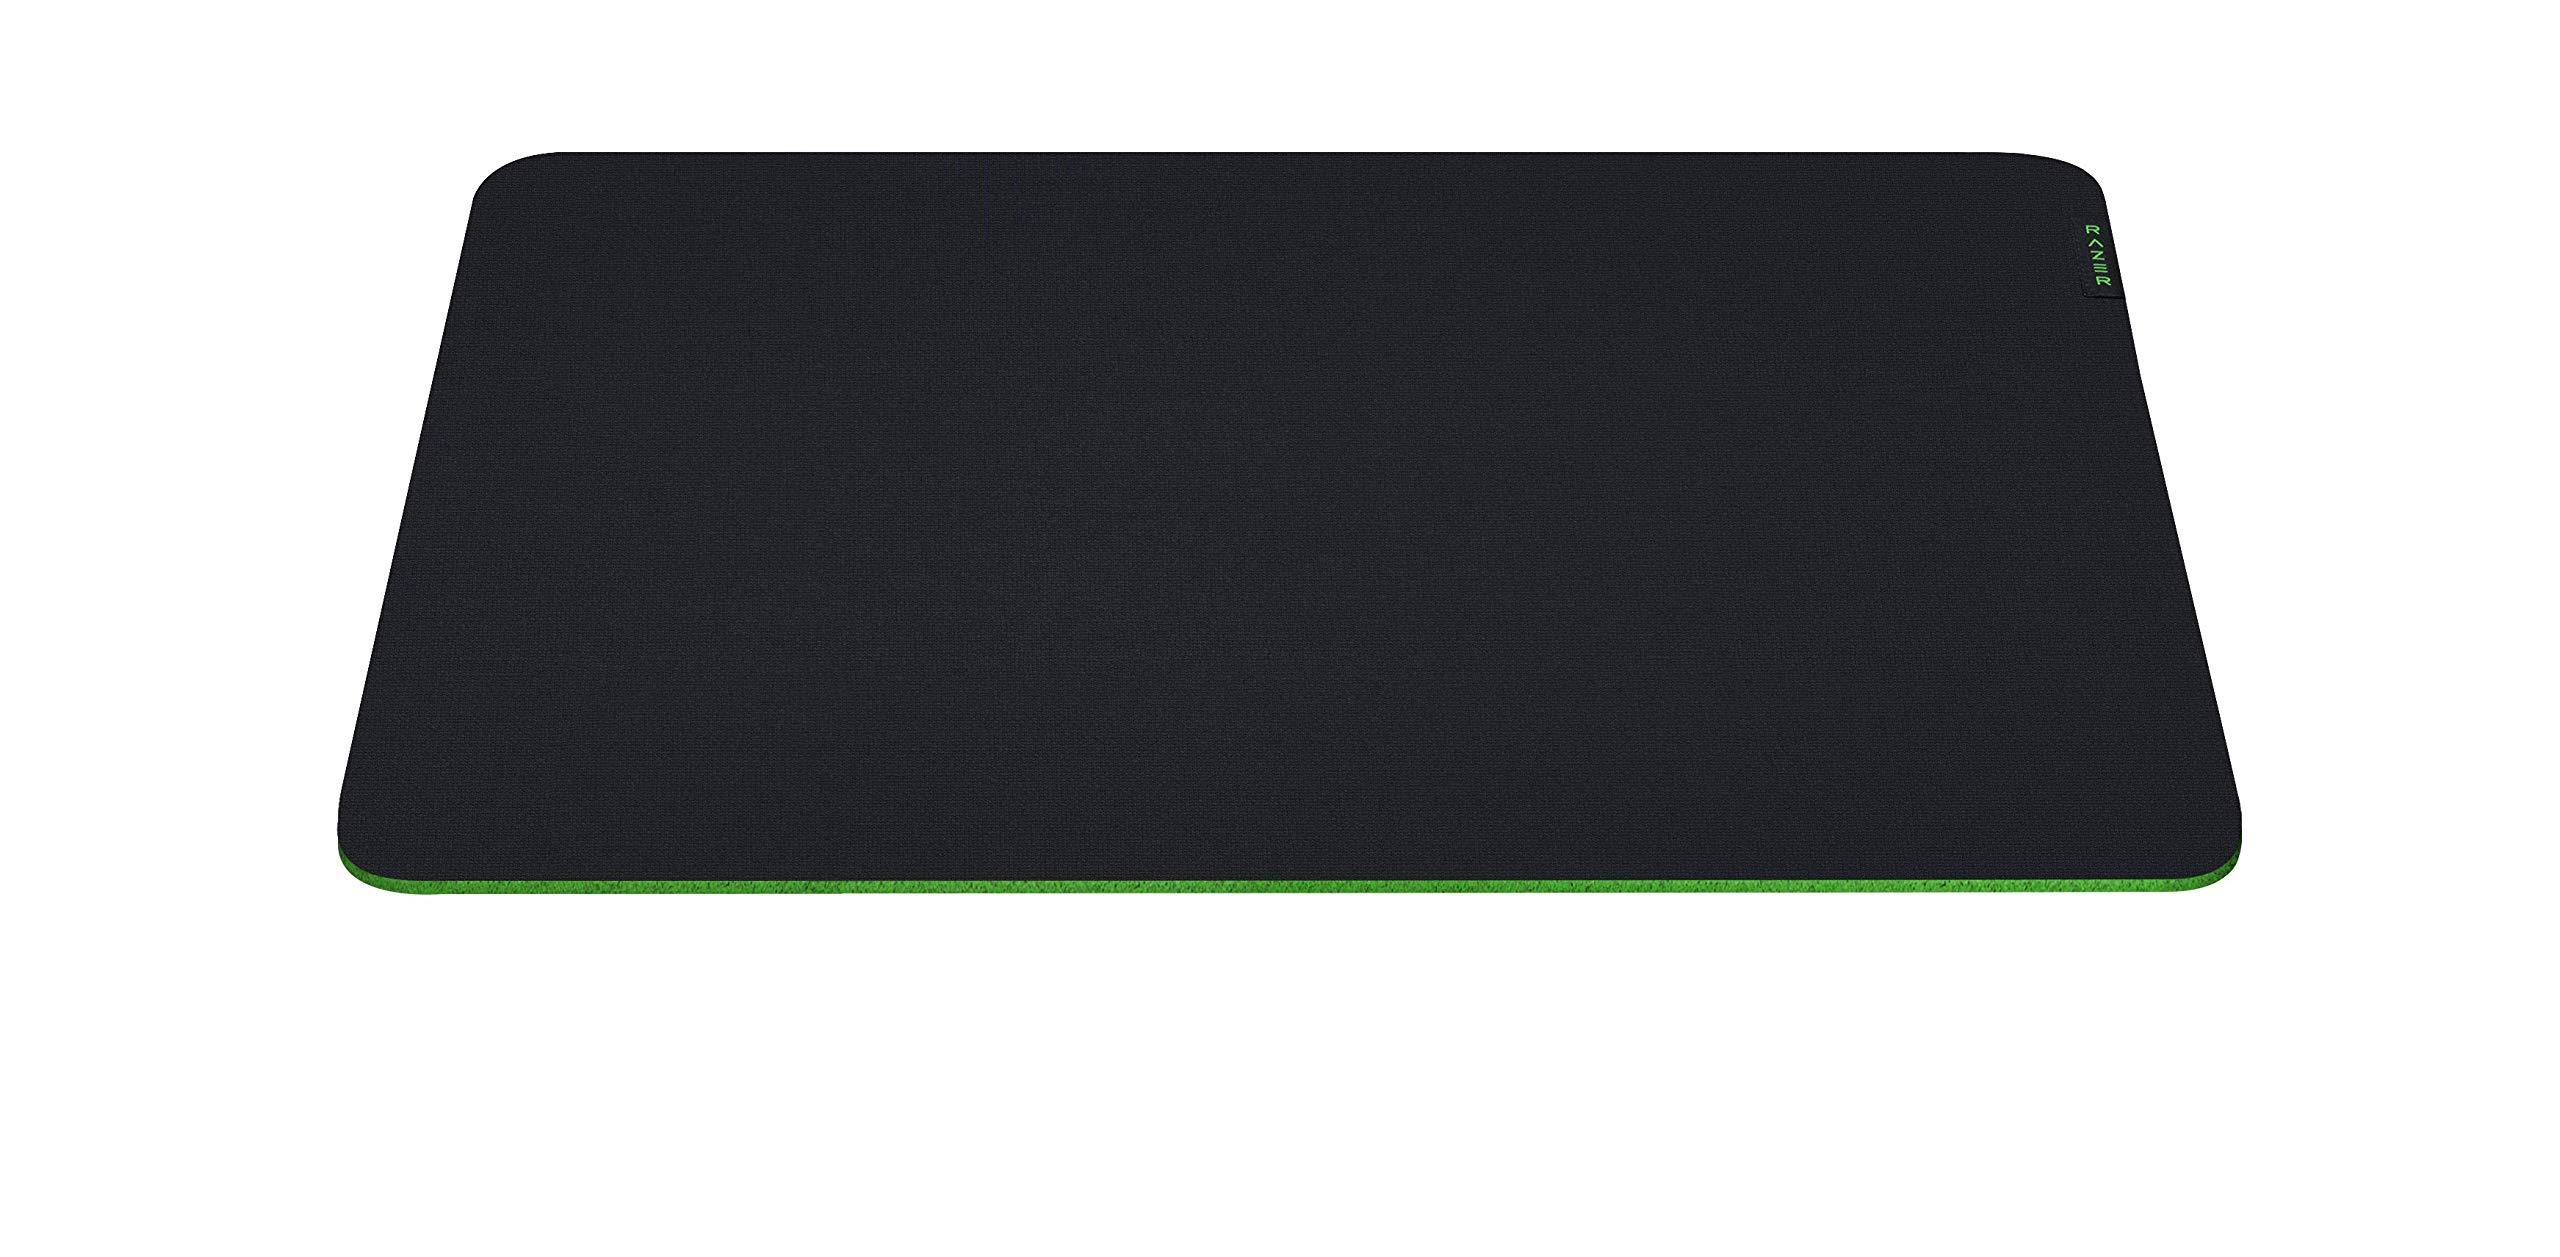 Razer Gigantus V2 – M ゲーミングマウスパッド 布タイプ 小型サイズ 36 cm x 27.5 cm マイクロウェーブクロス 【日本正規代理店保証品】 RZ02-03330200-R3M1